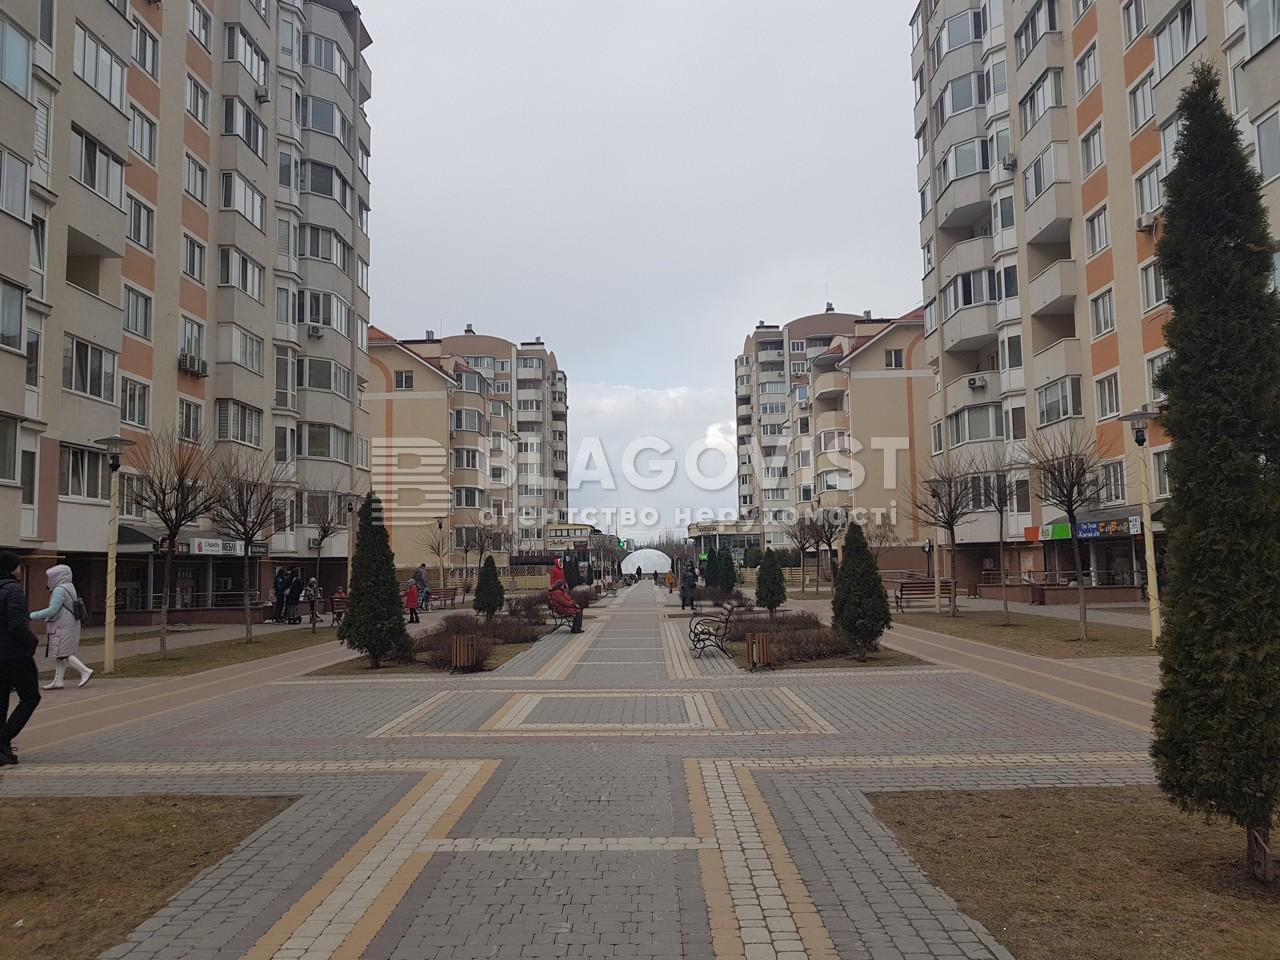 Квартира E-40784, Леси Украинки, 4, Софиевская Борщаговка - Фото 46